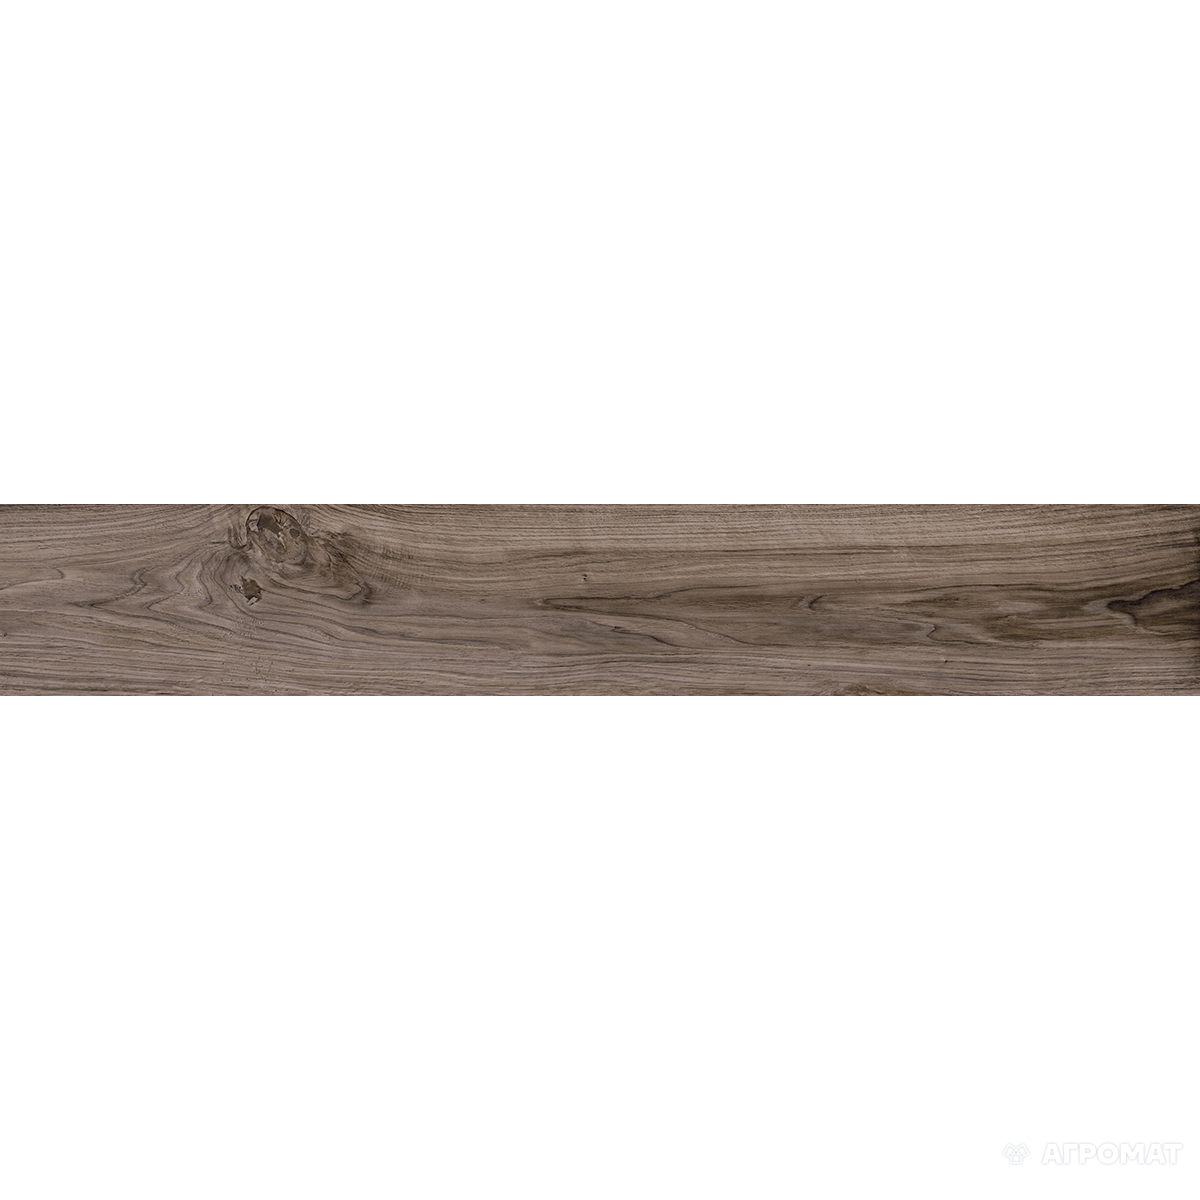 Керамогранит Zeus Ceramica (Зевс Керамика) Allwood ZZXWU6R